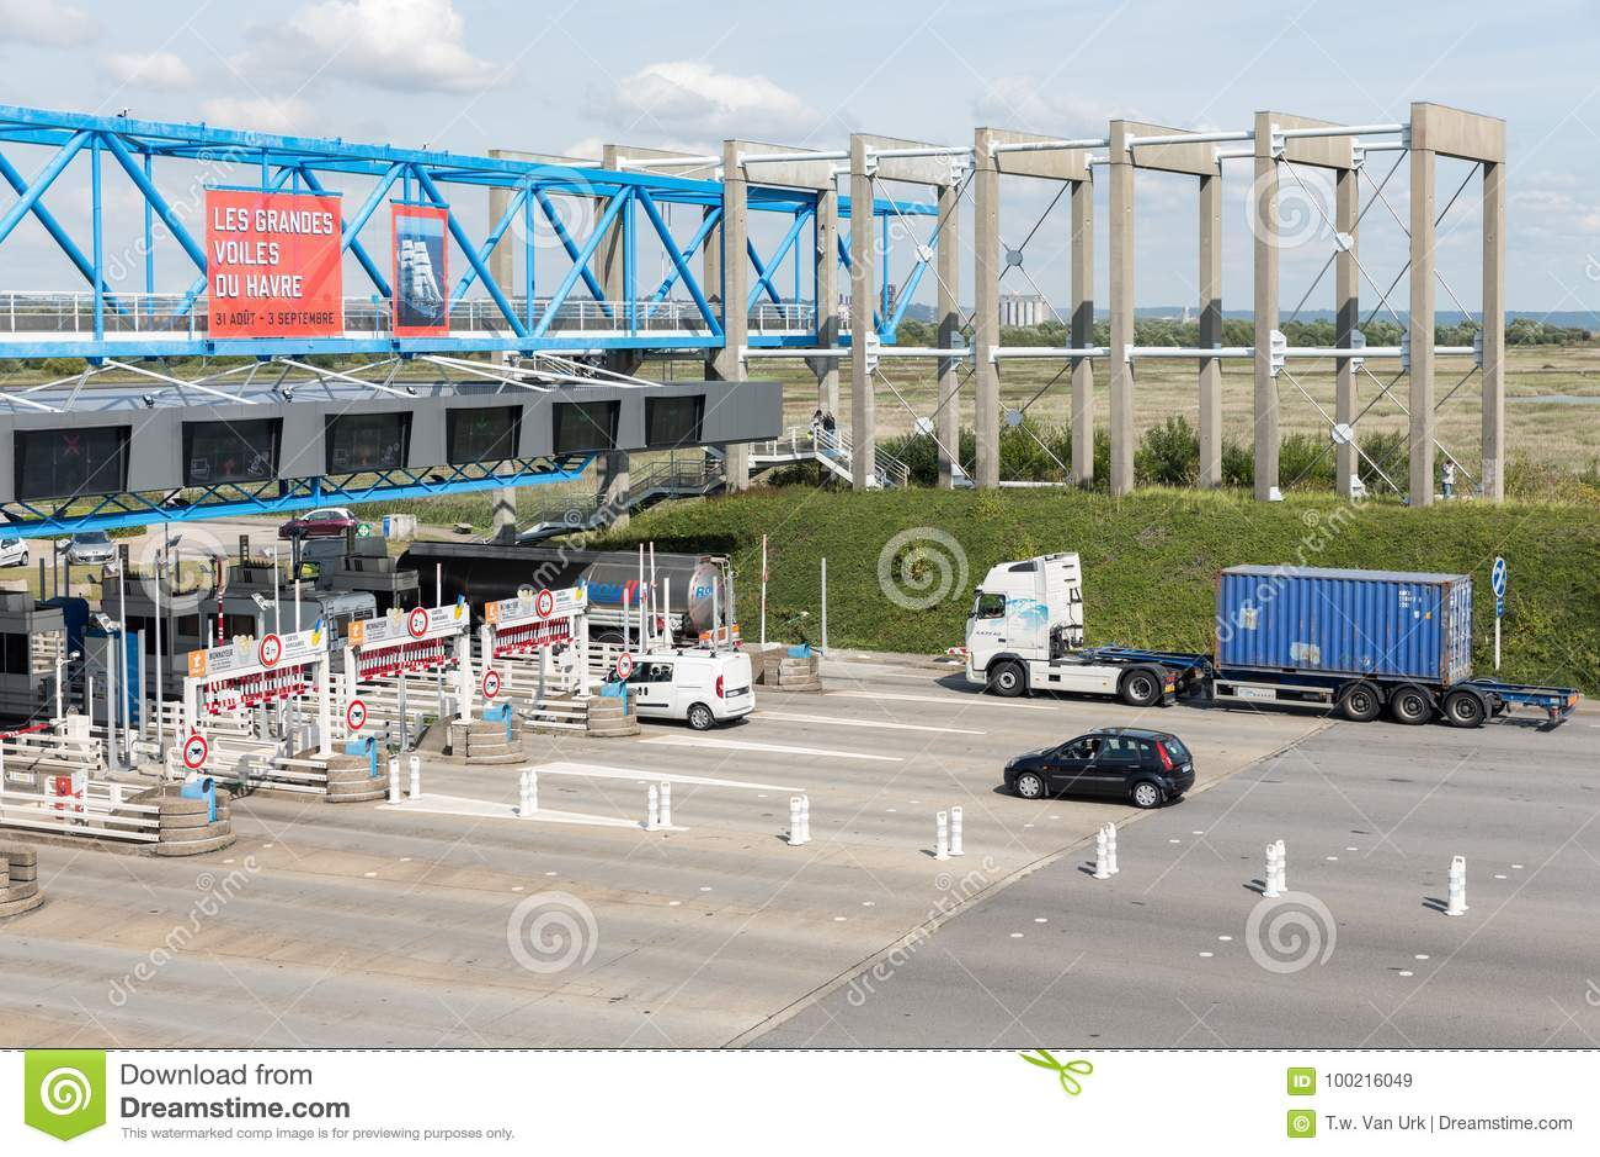 french toll station for pont de normandie over river seine editorial stock image image of. Black Bedroom Furniture Sets. Home Design Ideas